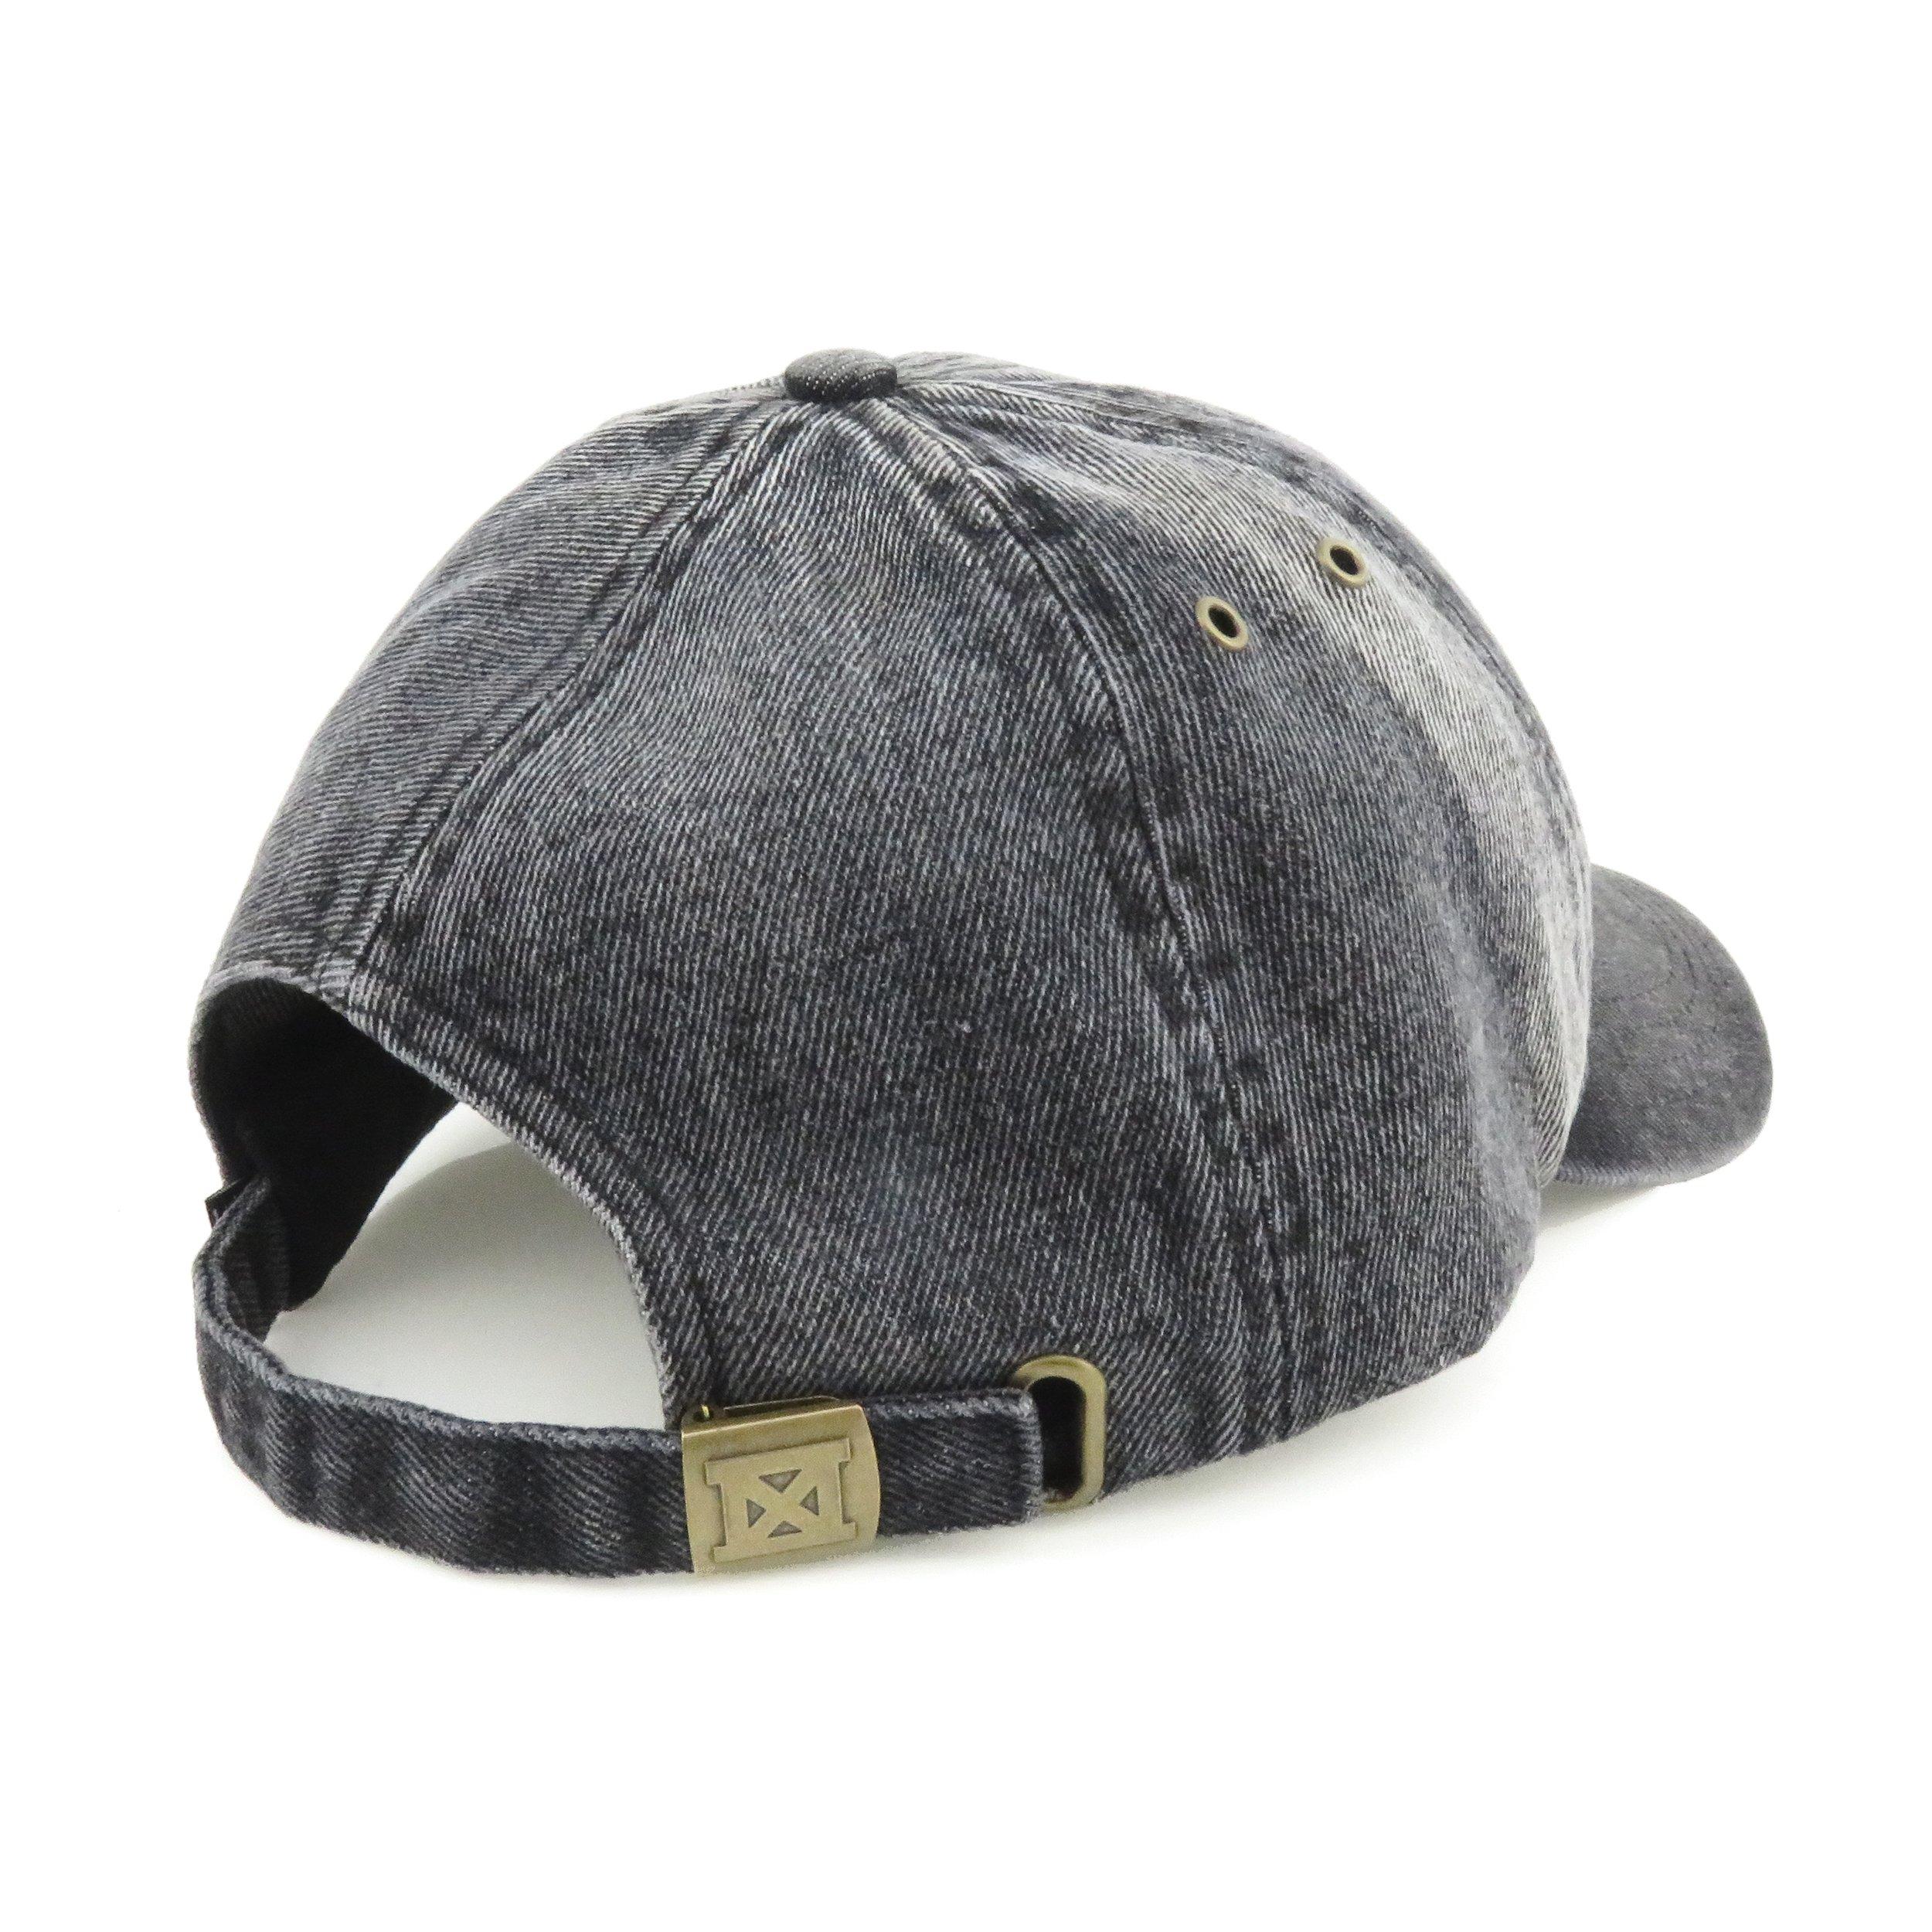 637c74d753c Made Urban Apparel KC Dad Hat - Black Denim — Made in Kansas City